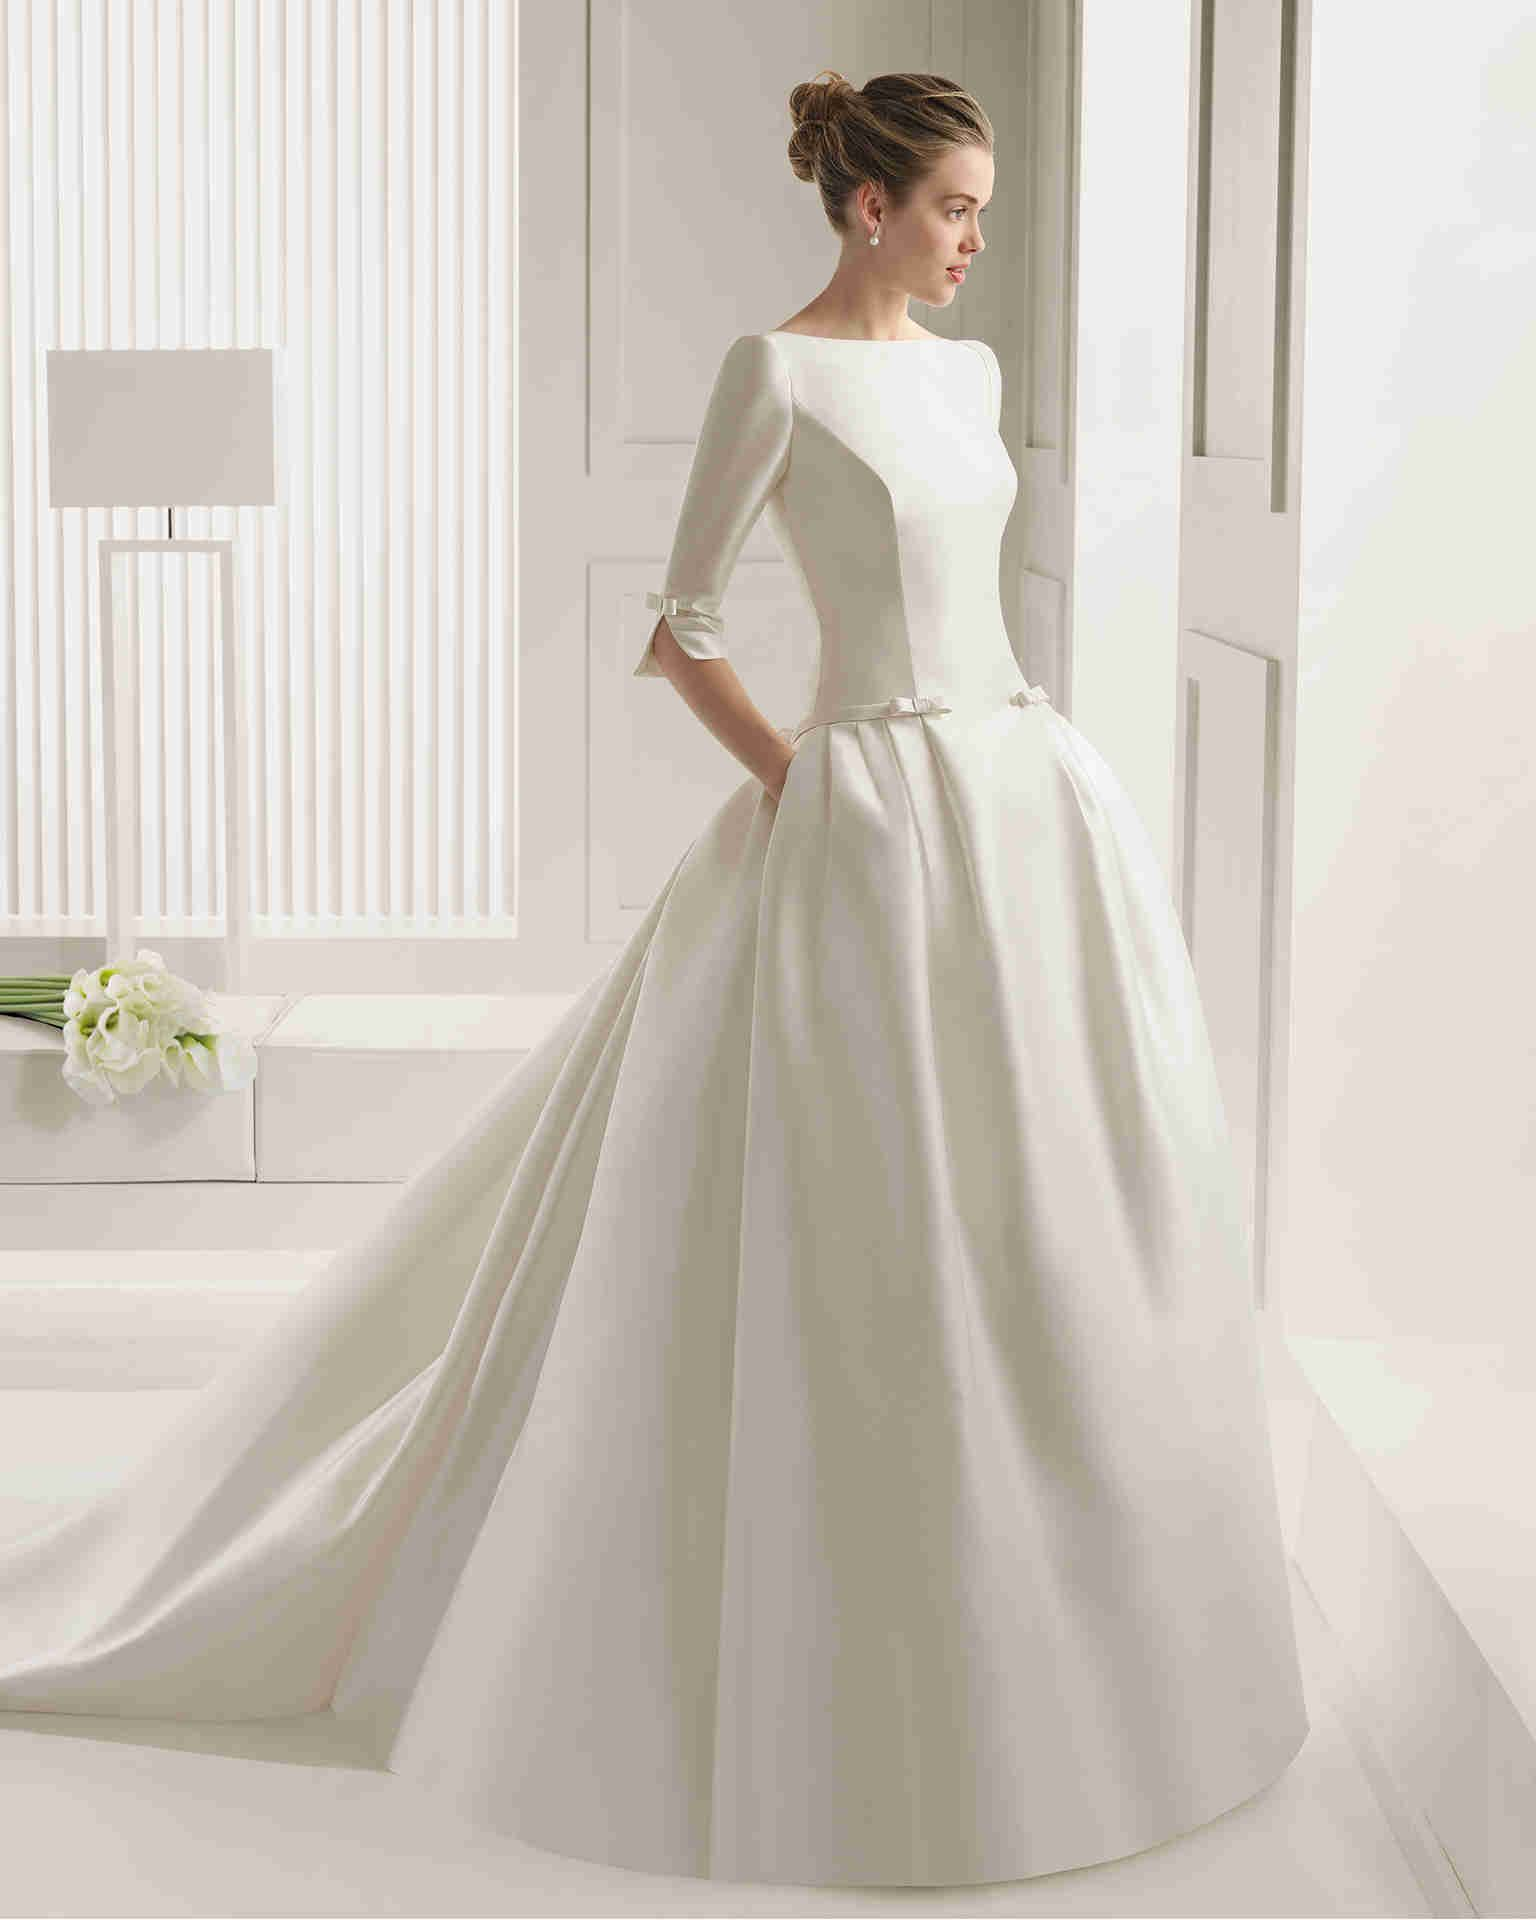 wishesbridal classic v neck half sleeve ballgown weddingdress